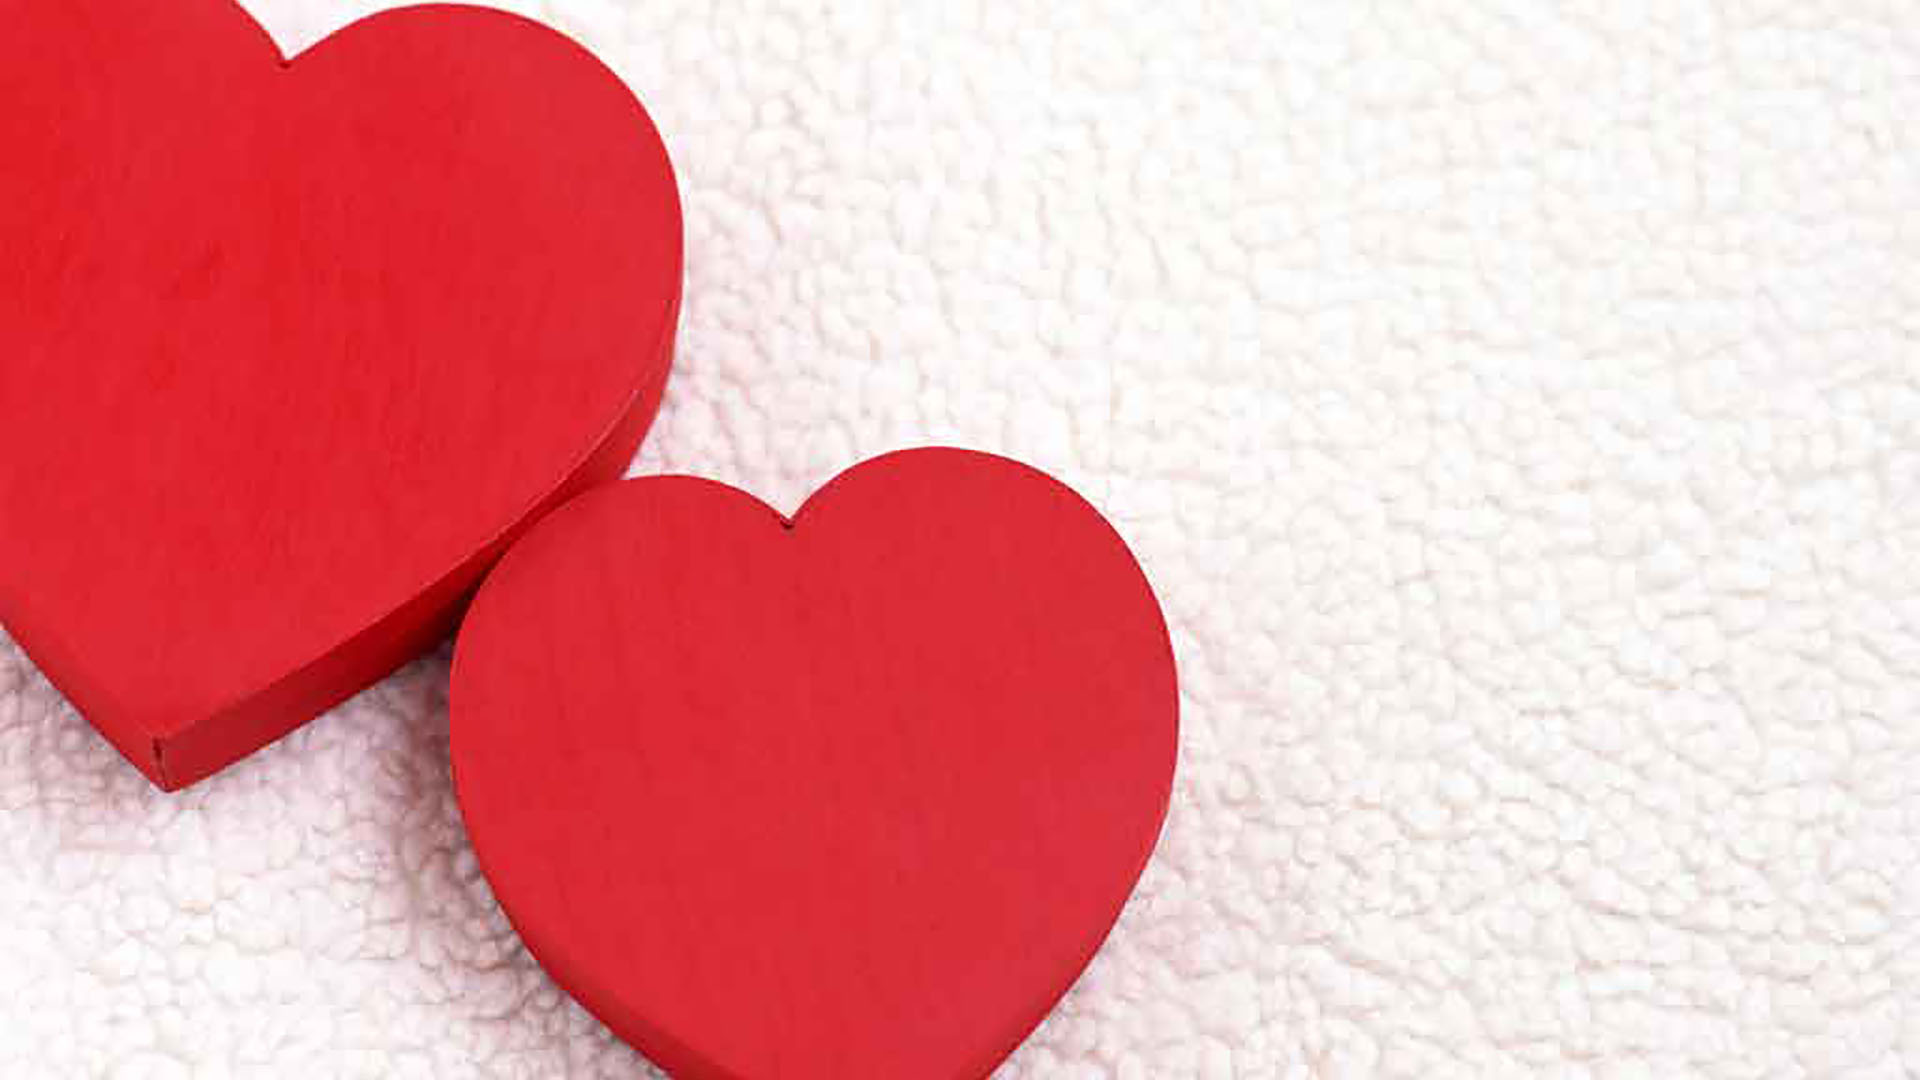 February 14 Valentine's Day Digital Signage Graphic